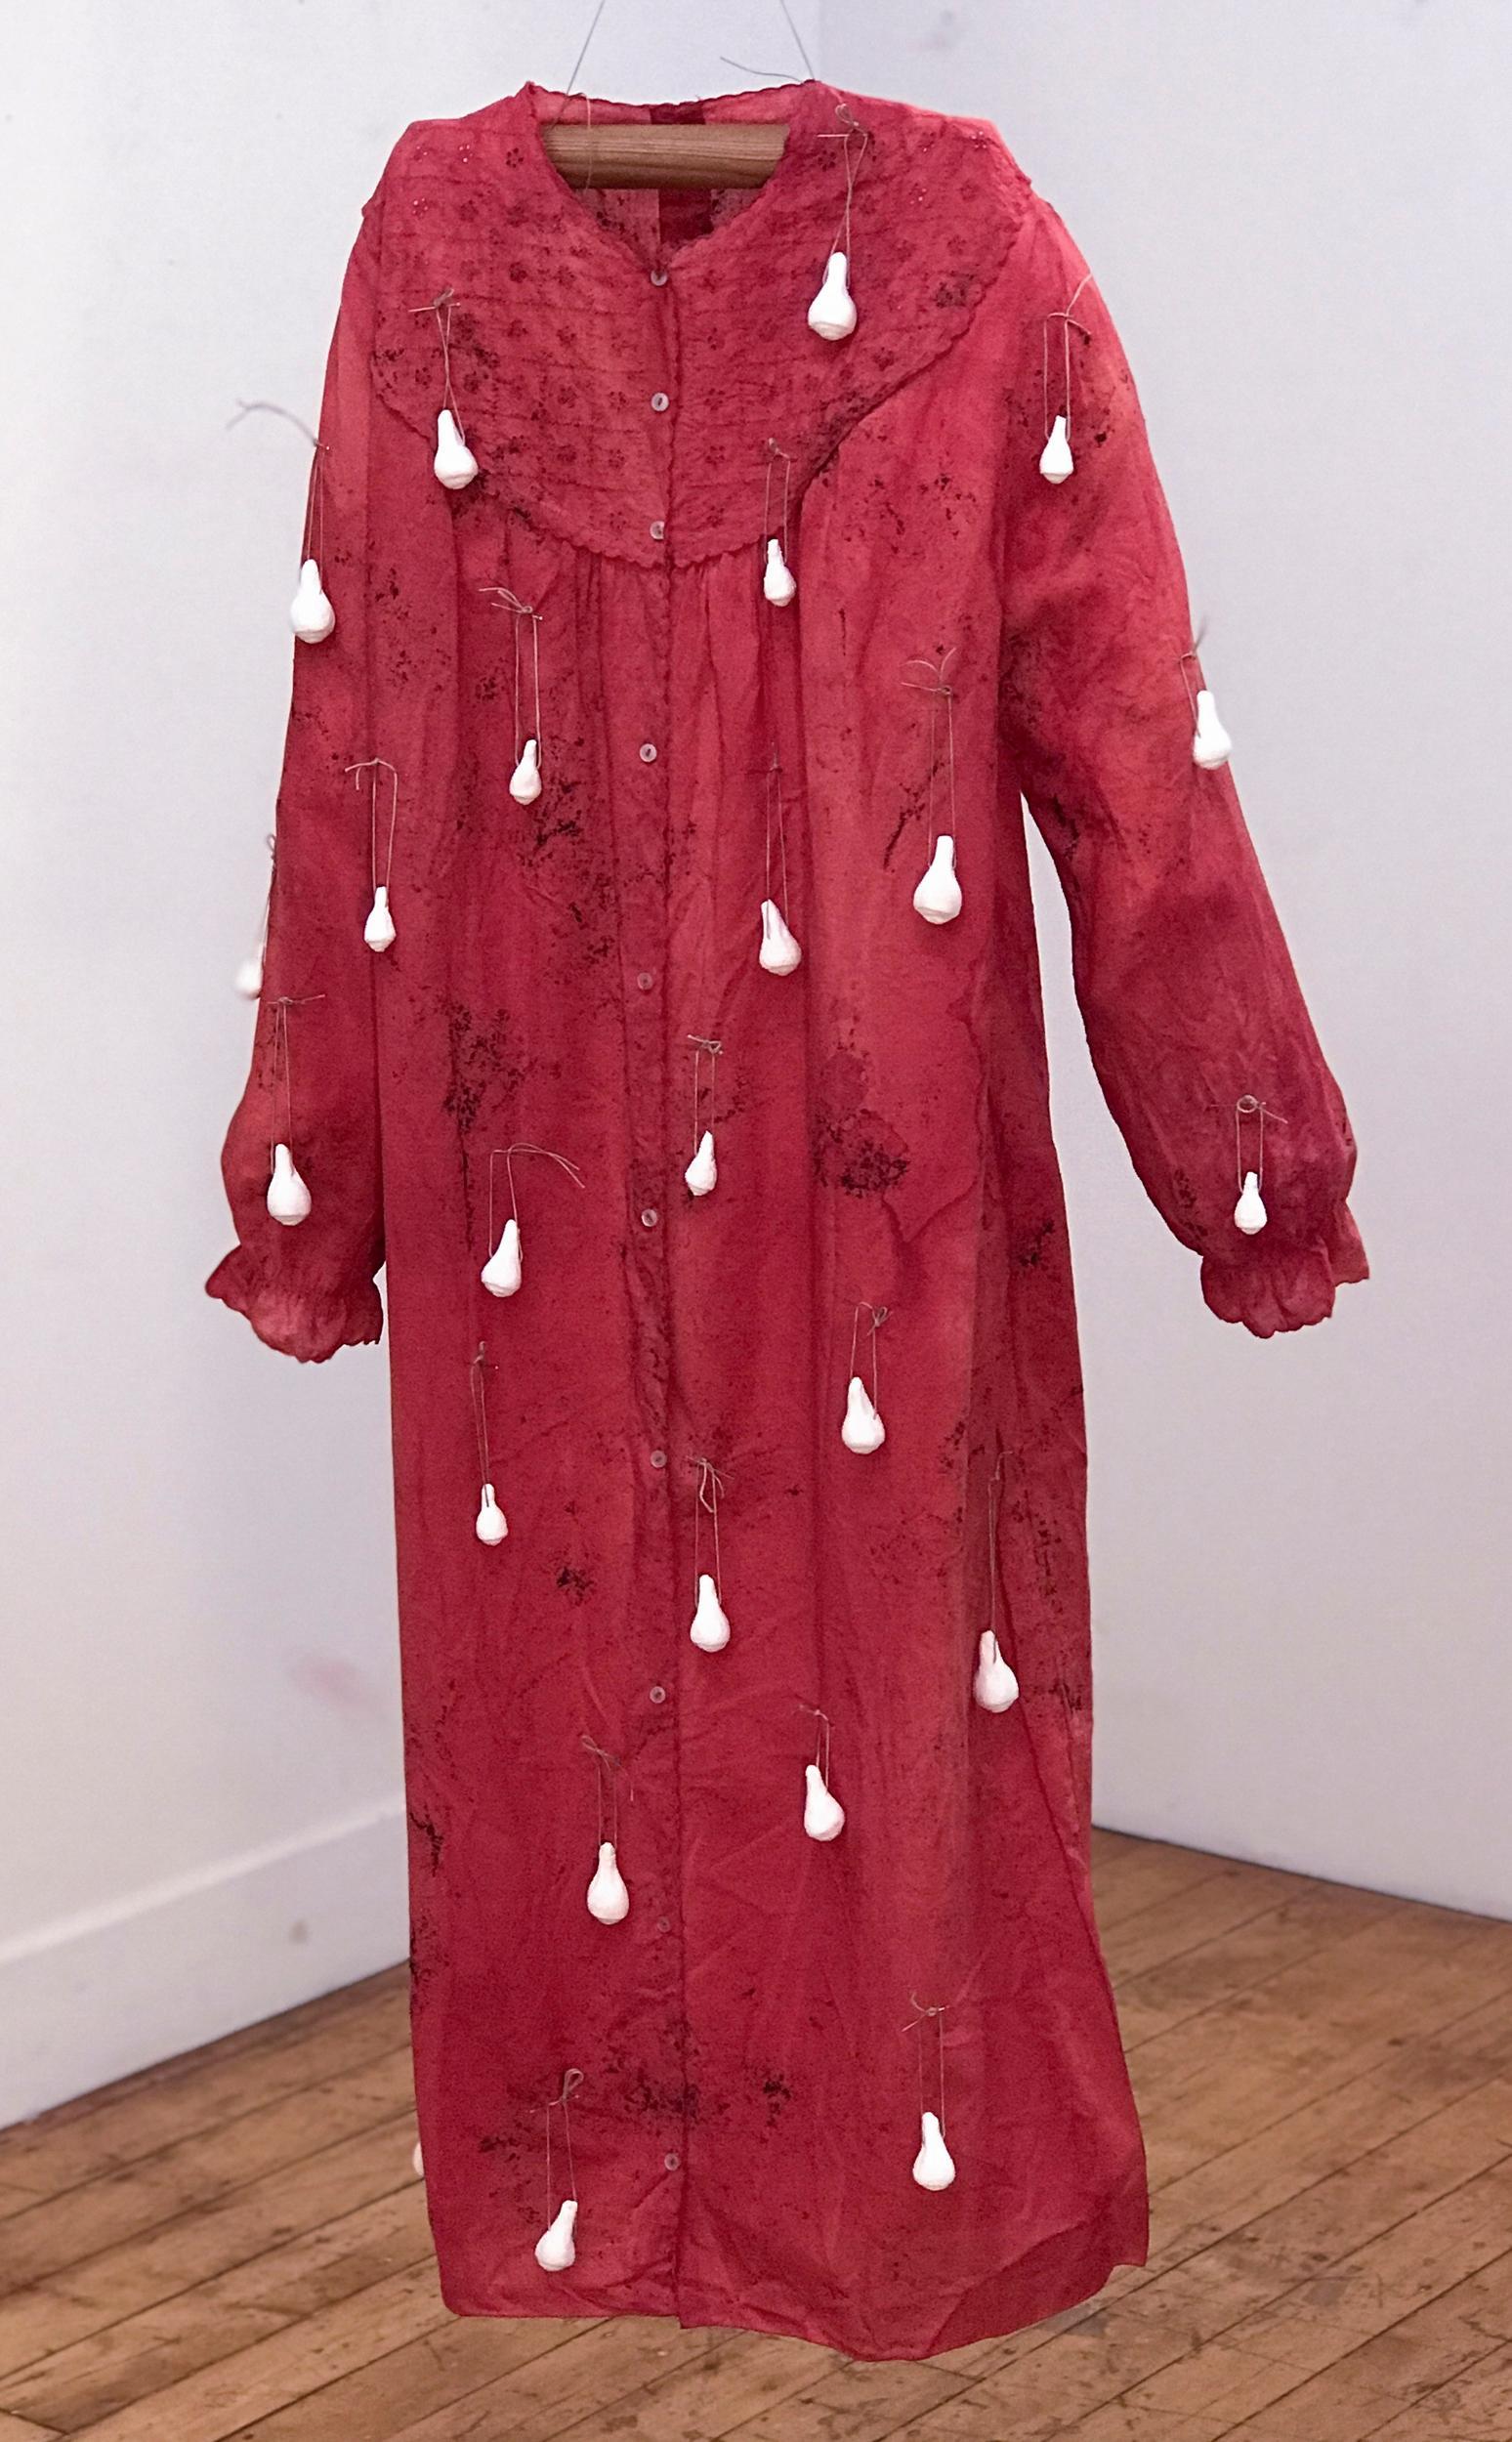 Patricia Miranda, Dreaming Awake, 2020, nightdress, cochineal dyes, plaster,